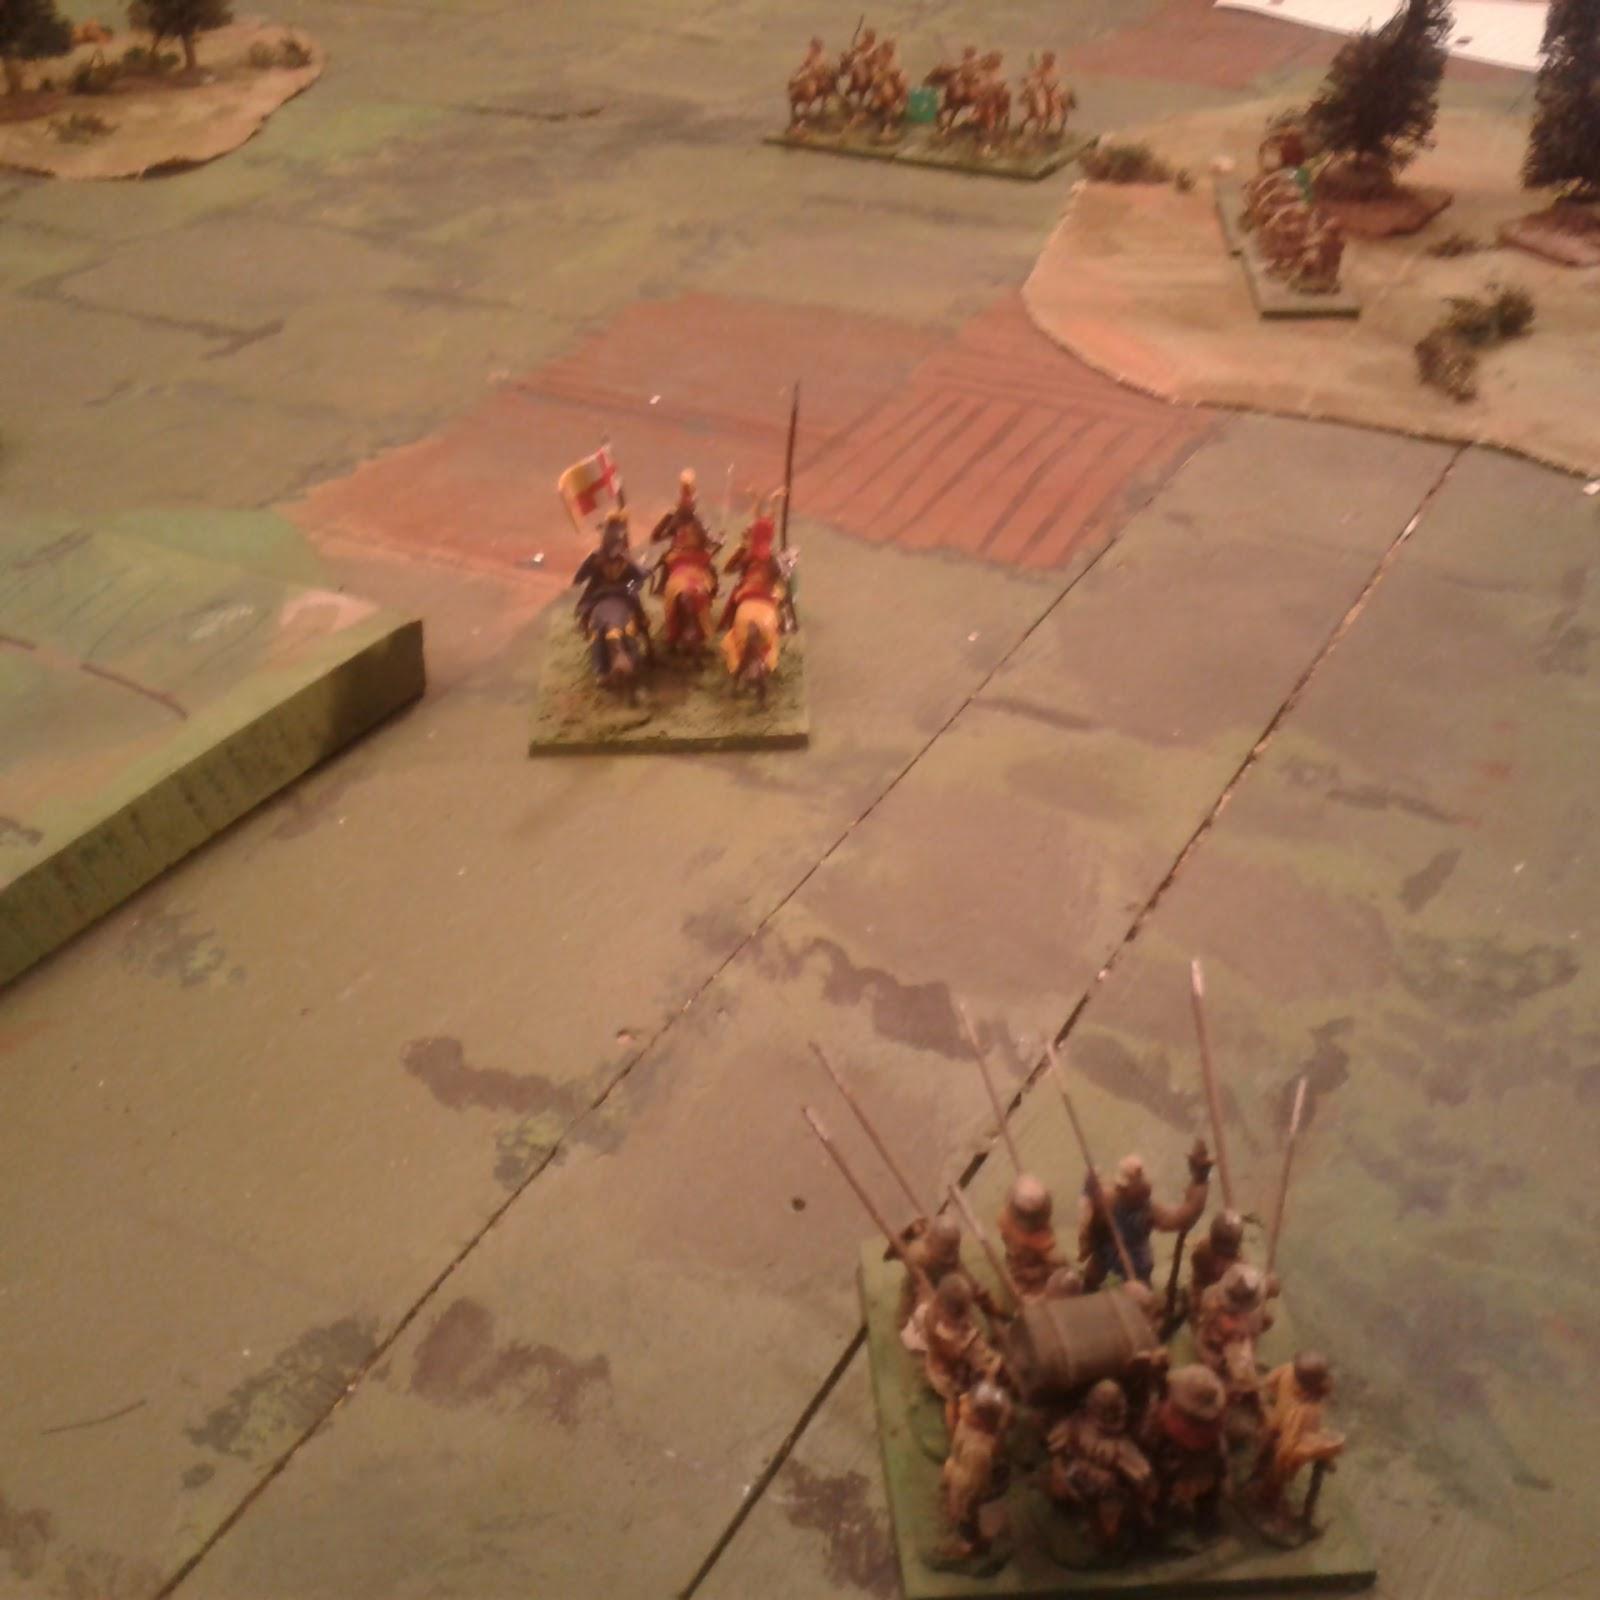 Into The Wild Warriors Summary: Gathering Of Hosts